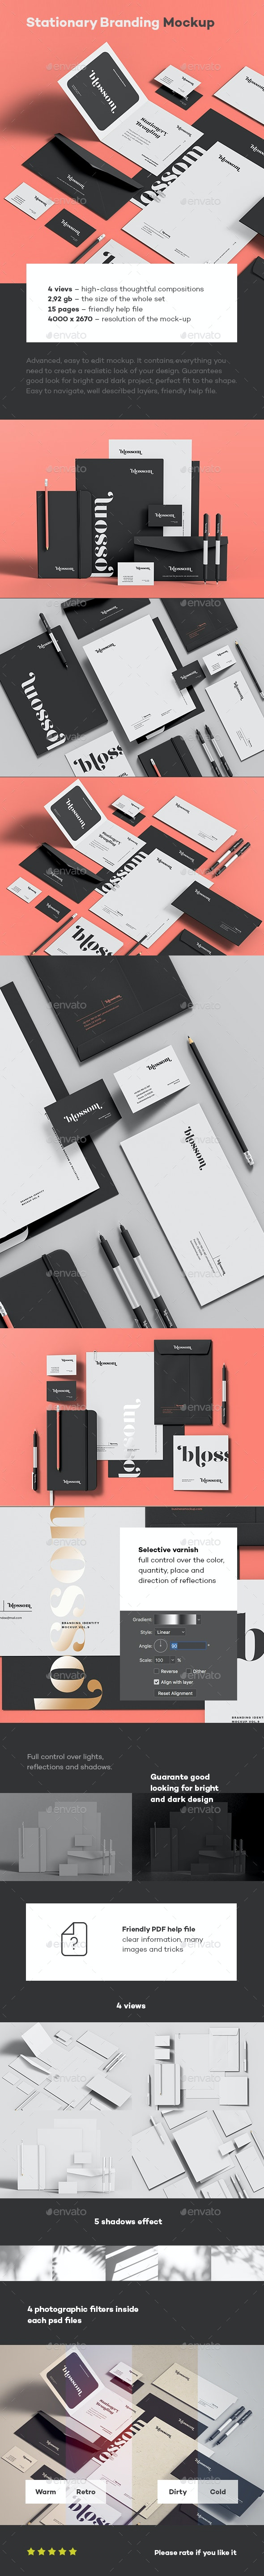 Stationary Branding Mock-up 9 - Stationery Print